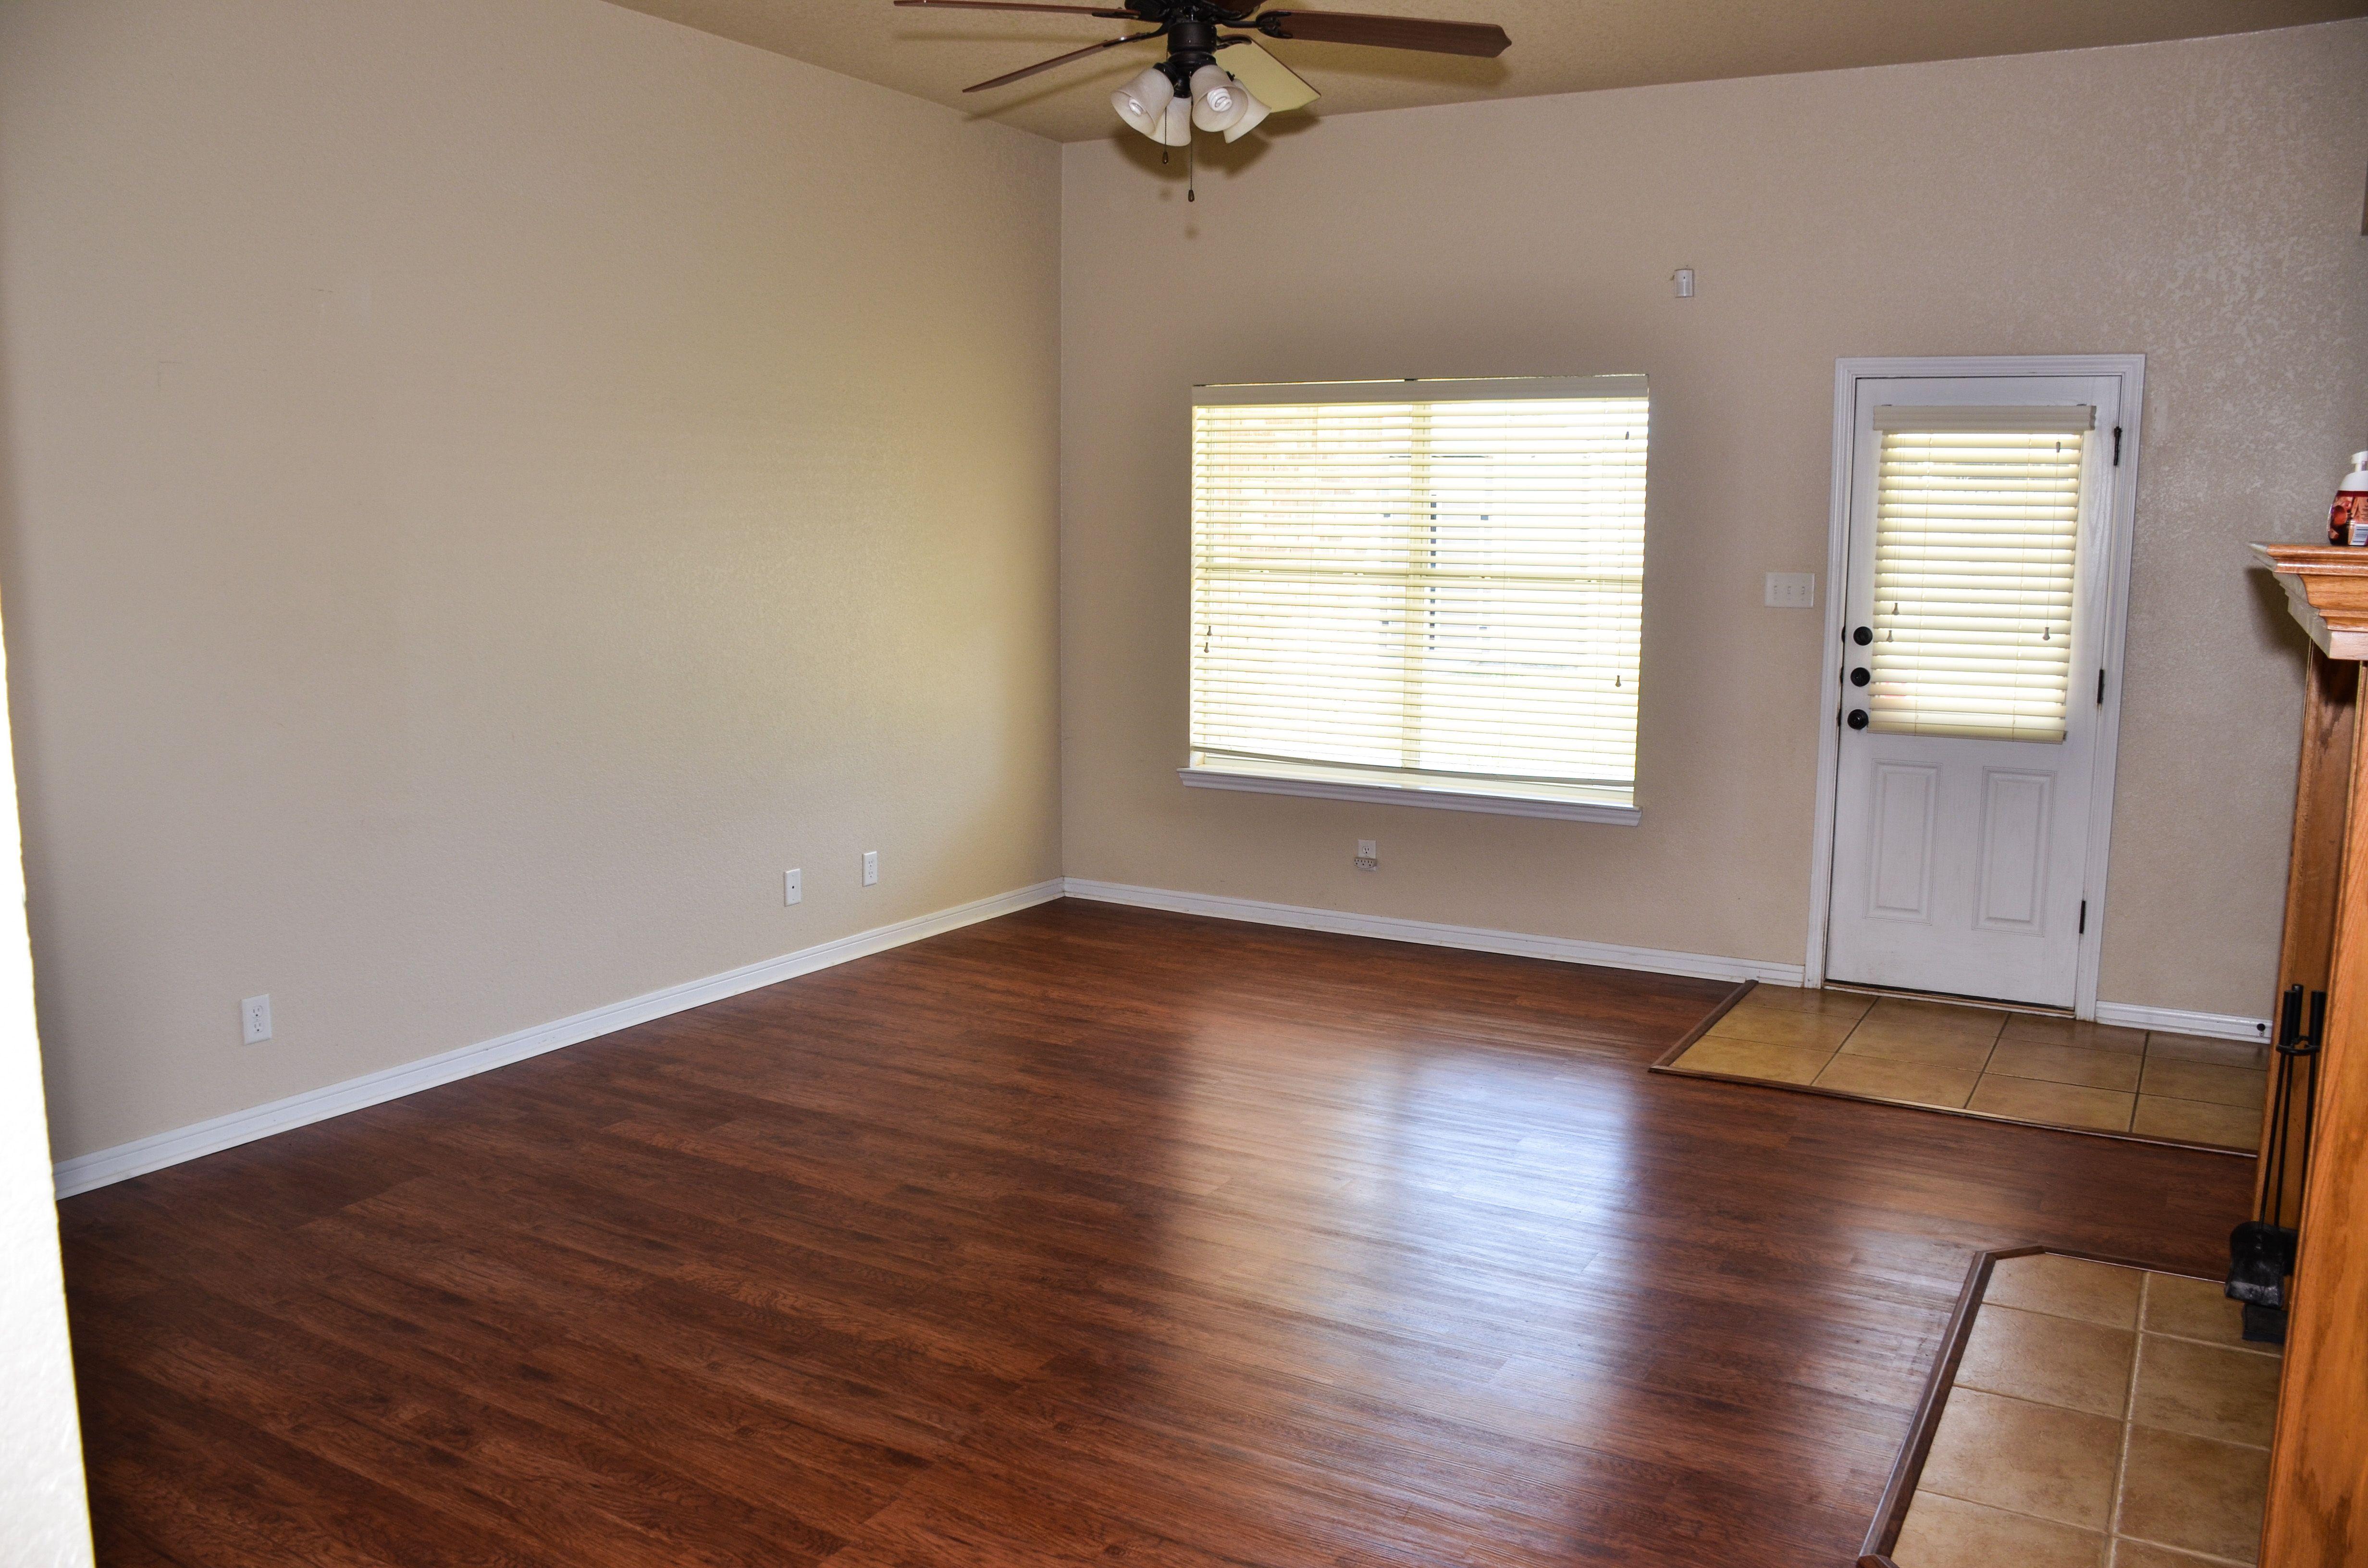 3 Bed 2 Bath For Rent Killeen TX Trimmier Estates 1125 Mo